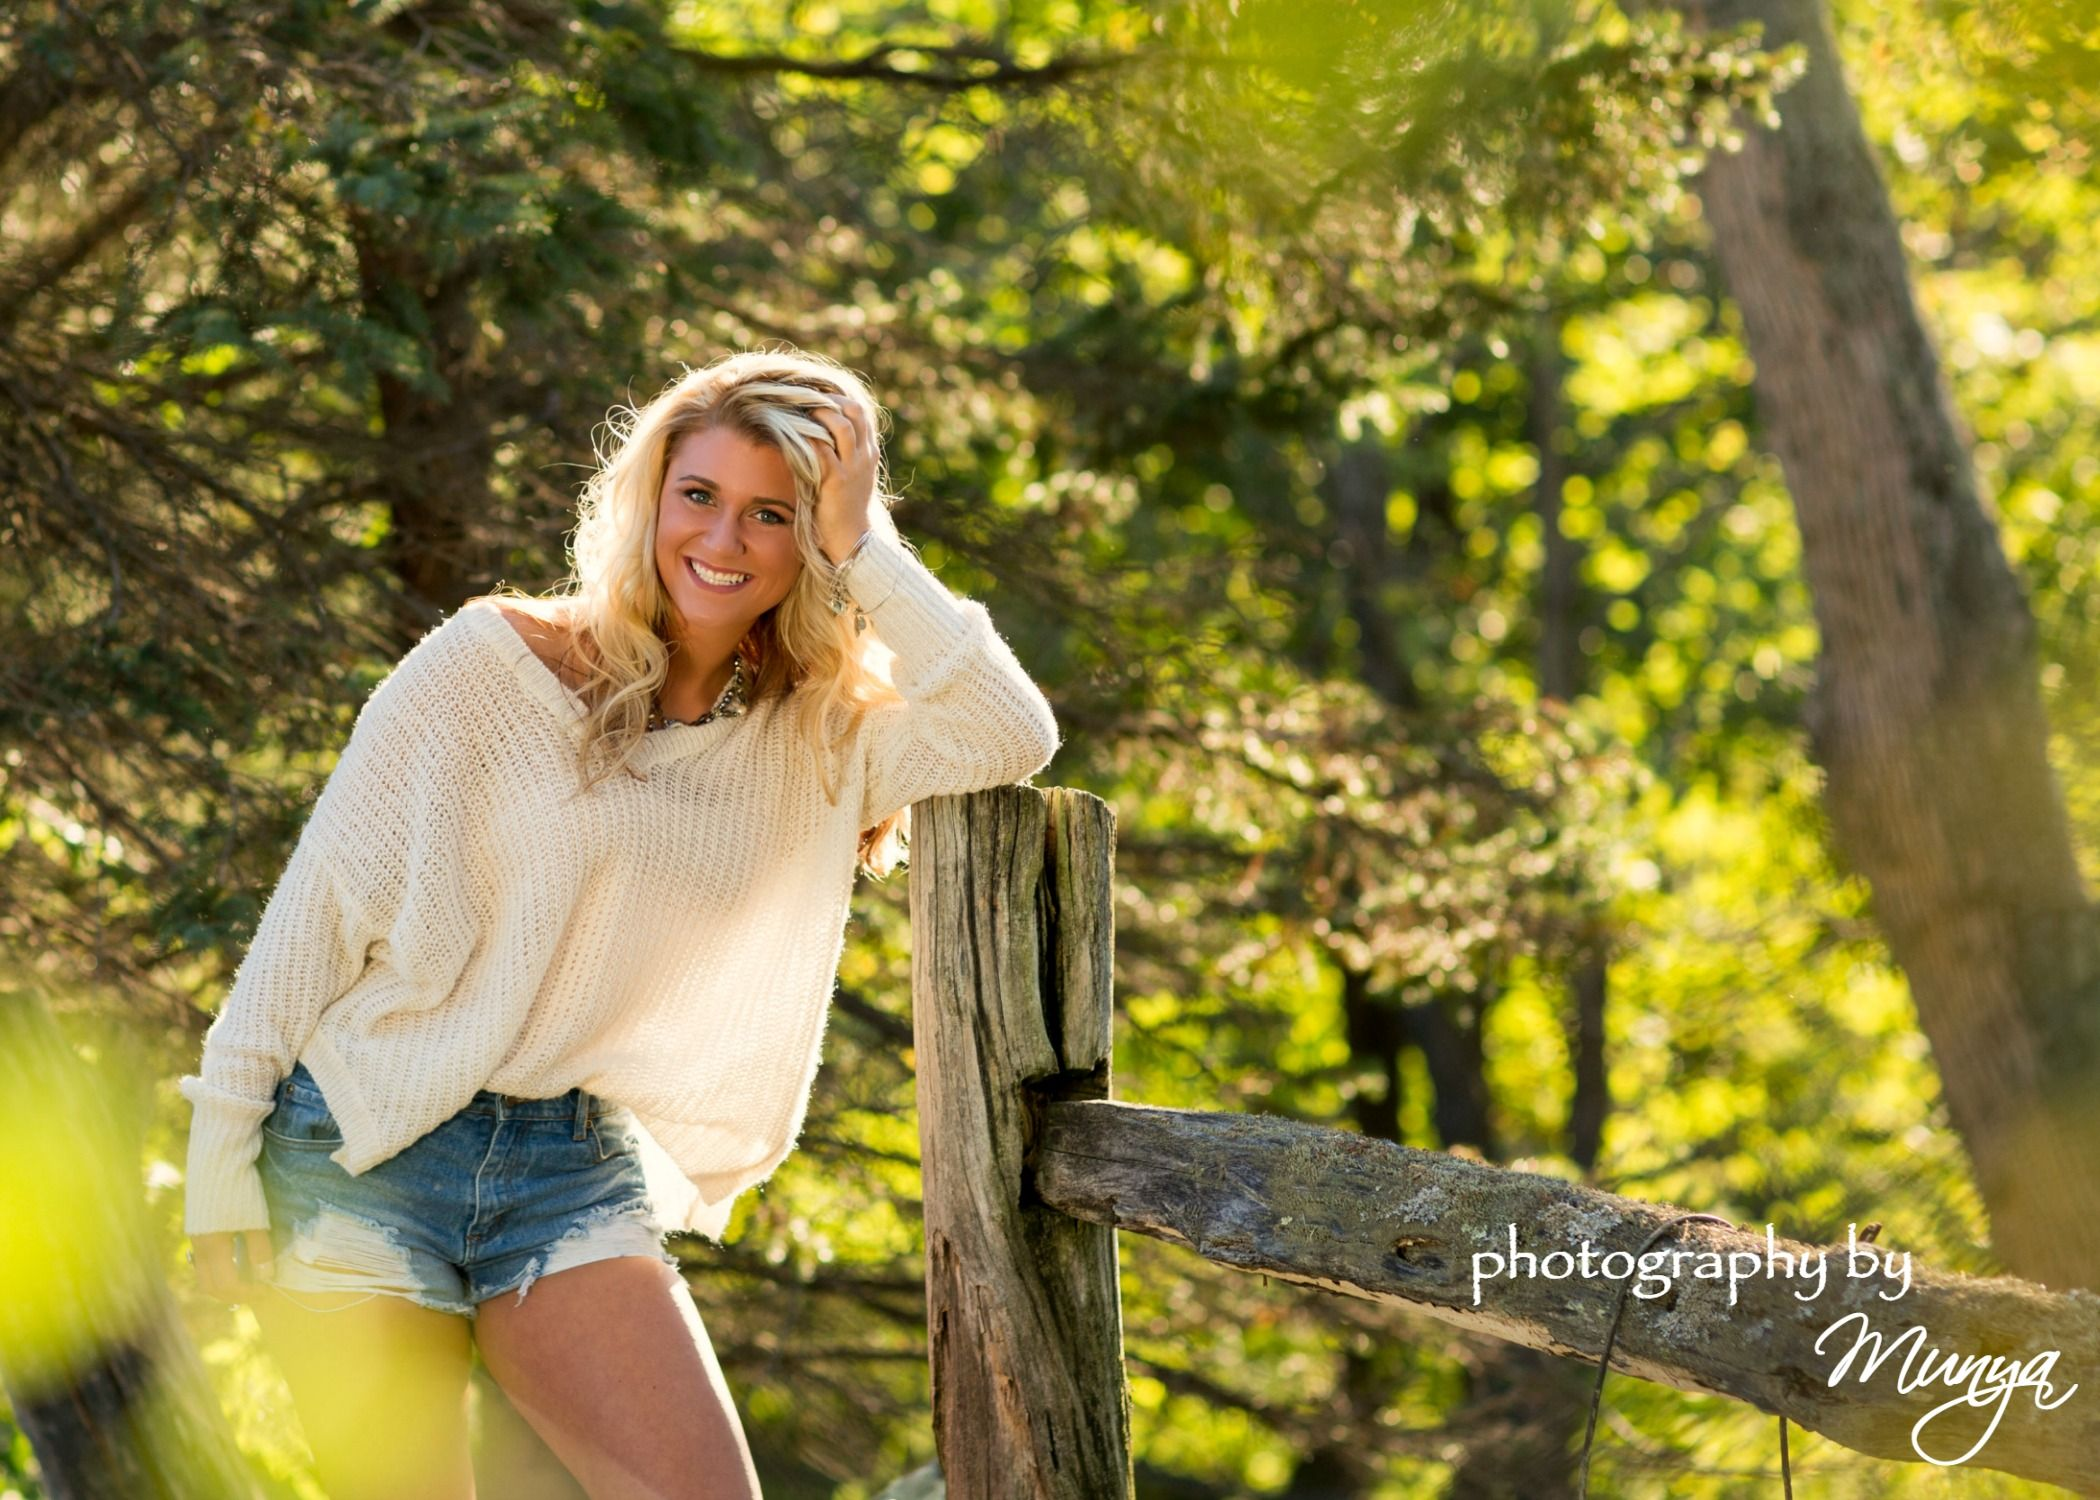 #steubenville #steubenvillephotographer #senior